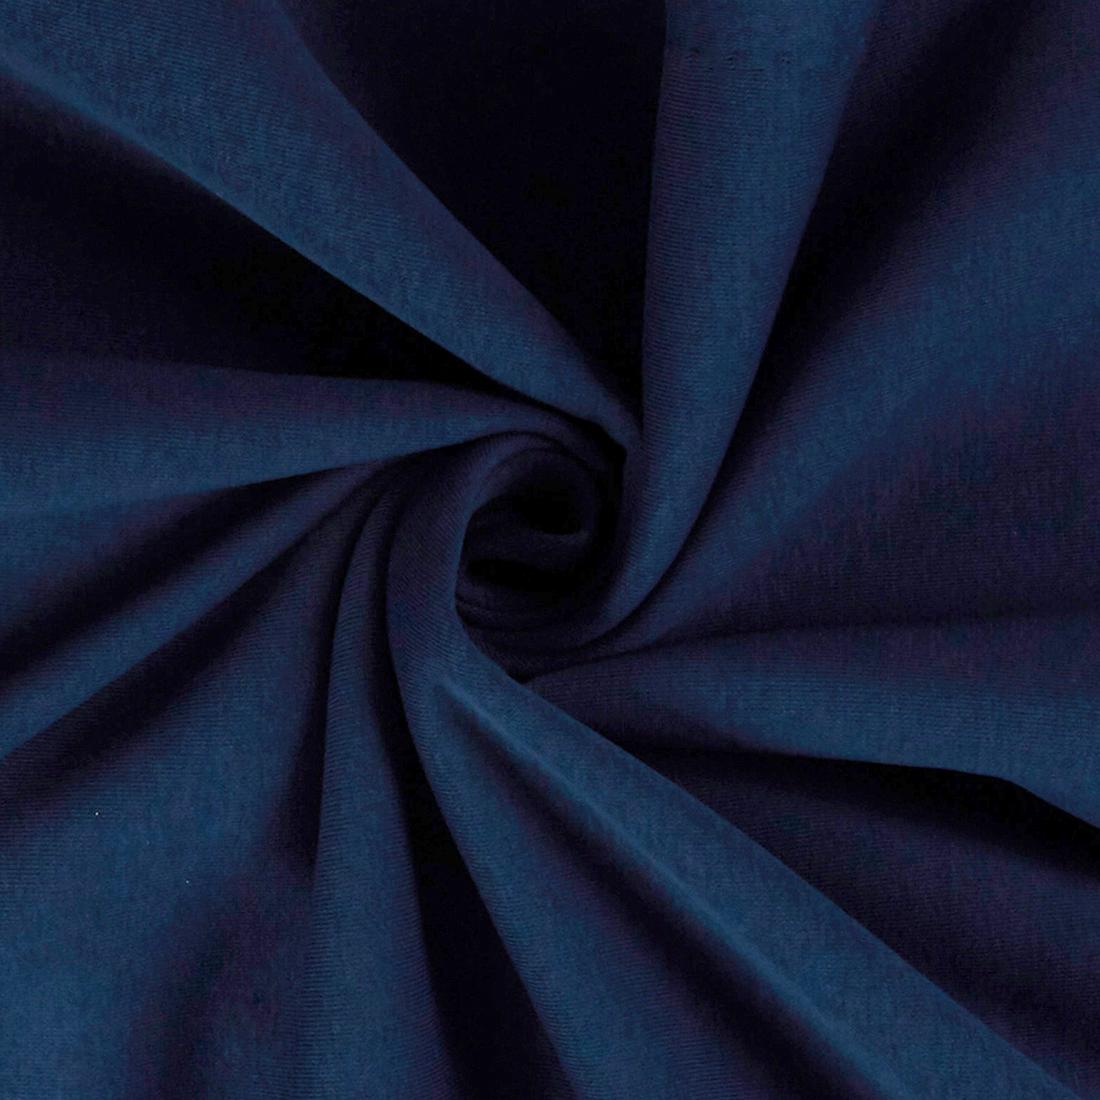 Sweatshirt Jersey Navy Dress Fabric